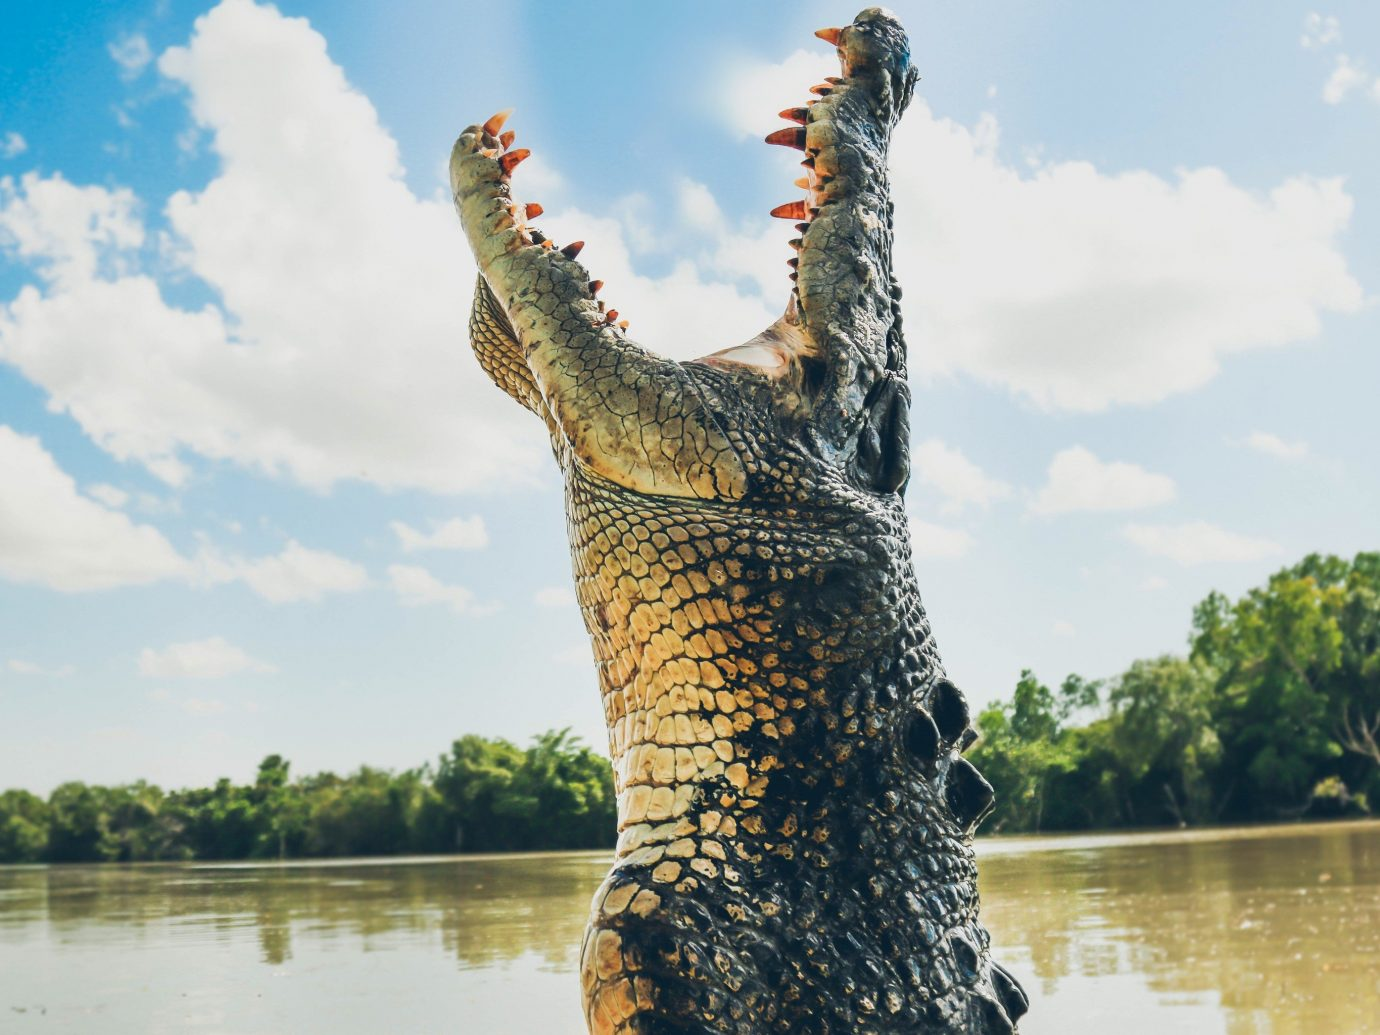 Trip Ideas sky outdoor water tree crocodile crocodilia River Lake Wildlife alligator plant